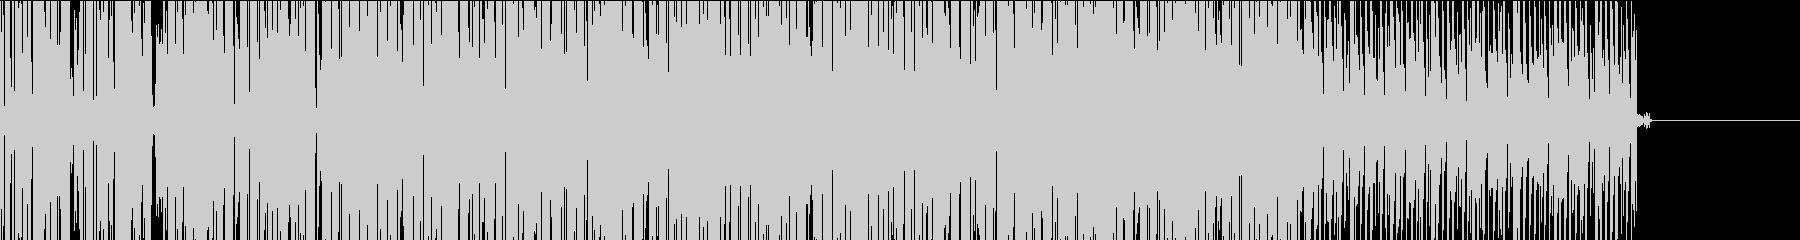 【TV・ラジオ】フラットなシーケンスBGの未再生の波形